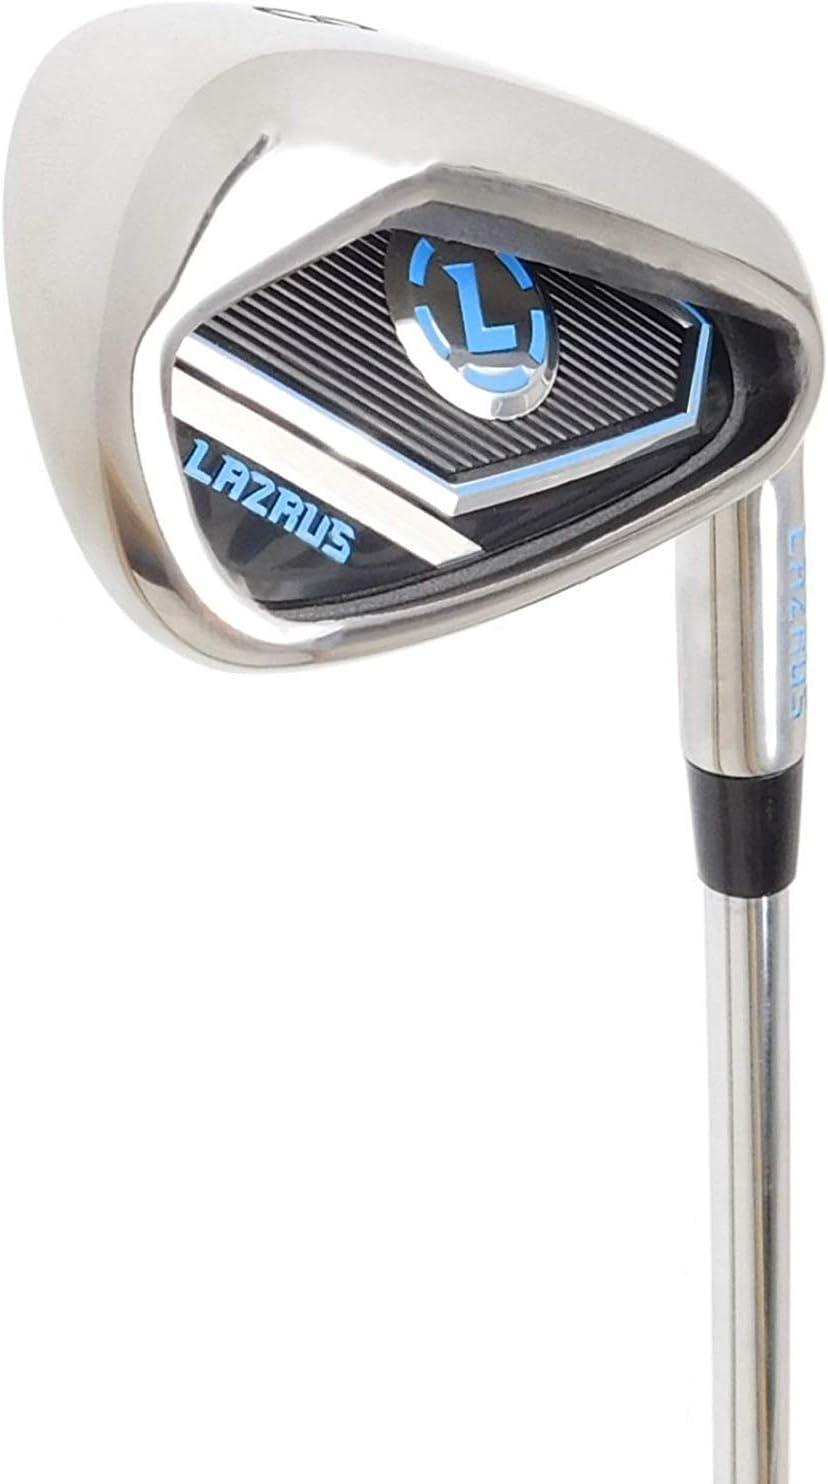 LAZRUS Premium Golf Irons Individual or Golf Irons Set for Men (4,5,6,7,8,9) Driving Irons (2&3) Right Hand Steel Shaft Regular Flex Golf Clubs - Best Golf Iron Set - Great Golf Gift